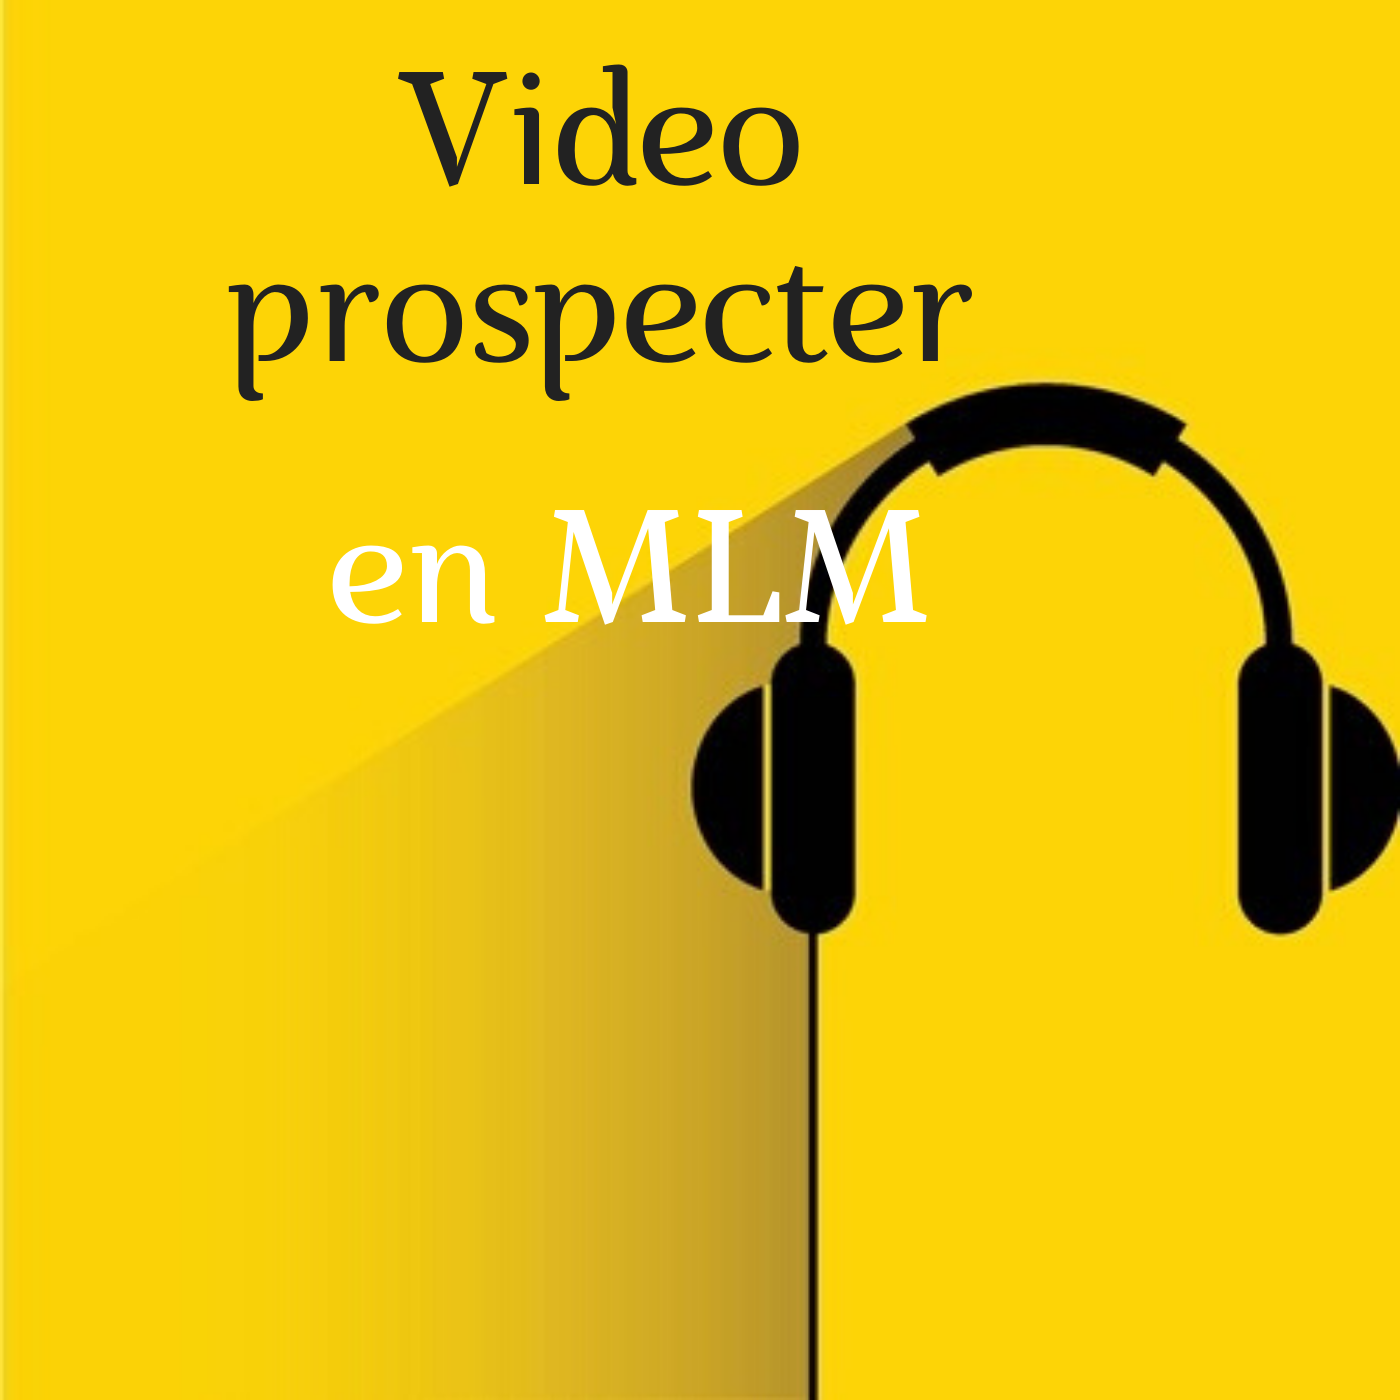 Vidéo-prospecter en MLM